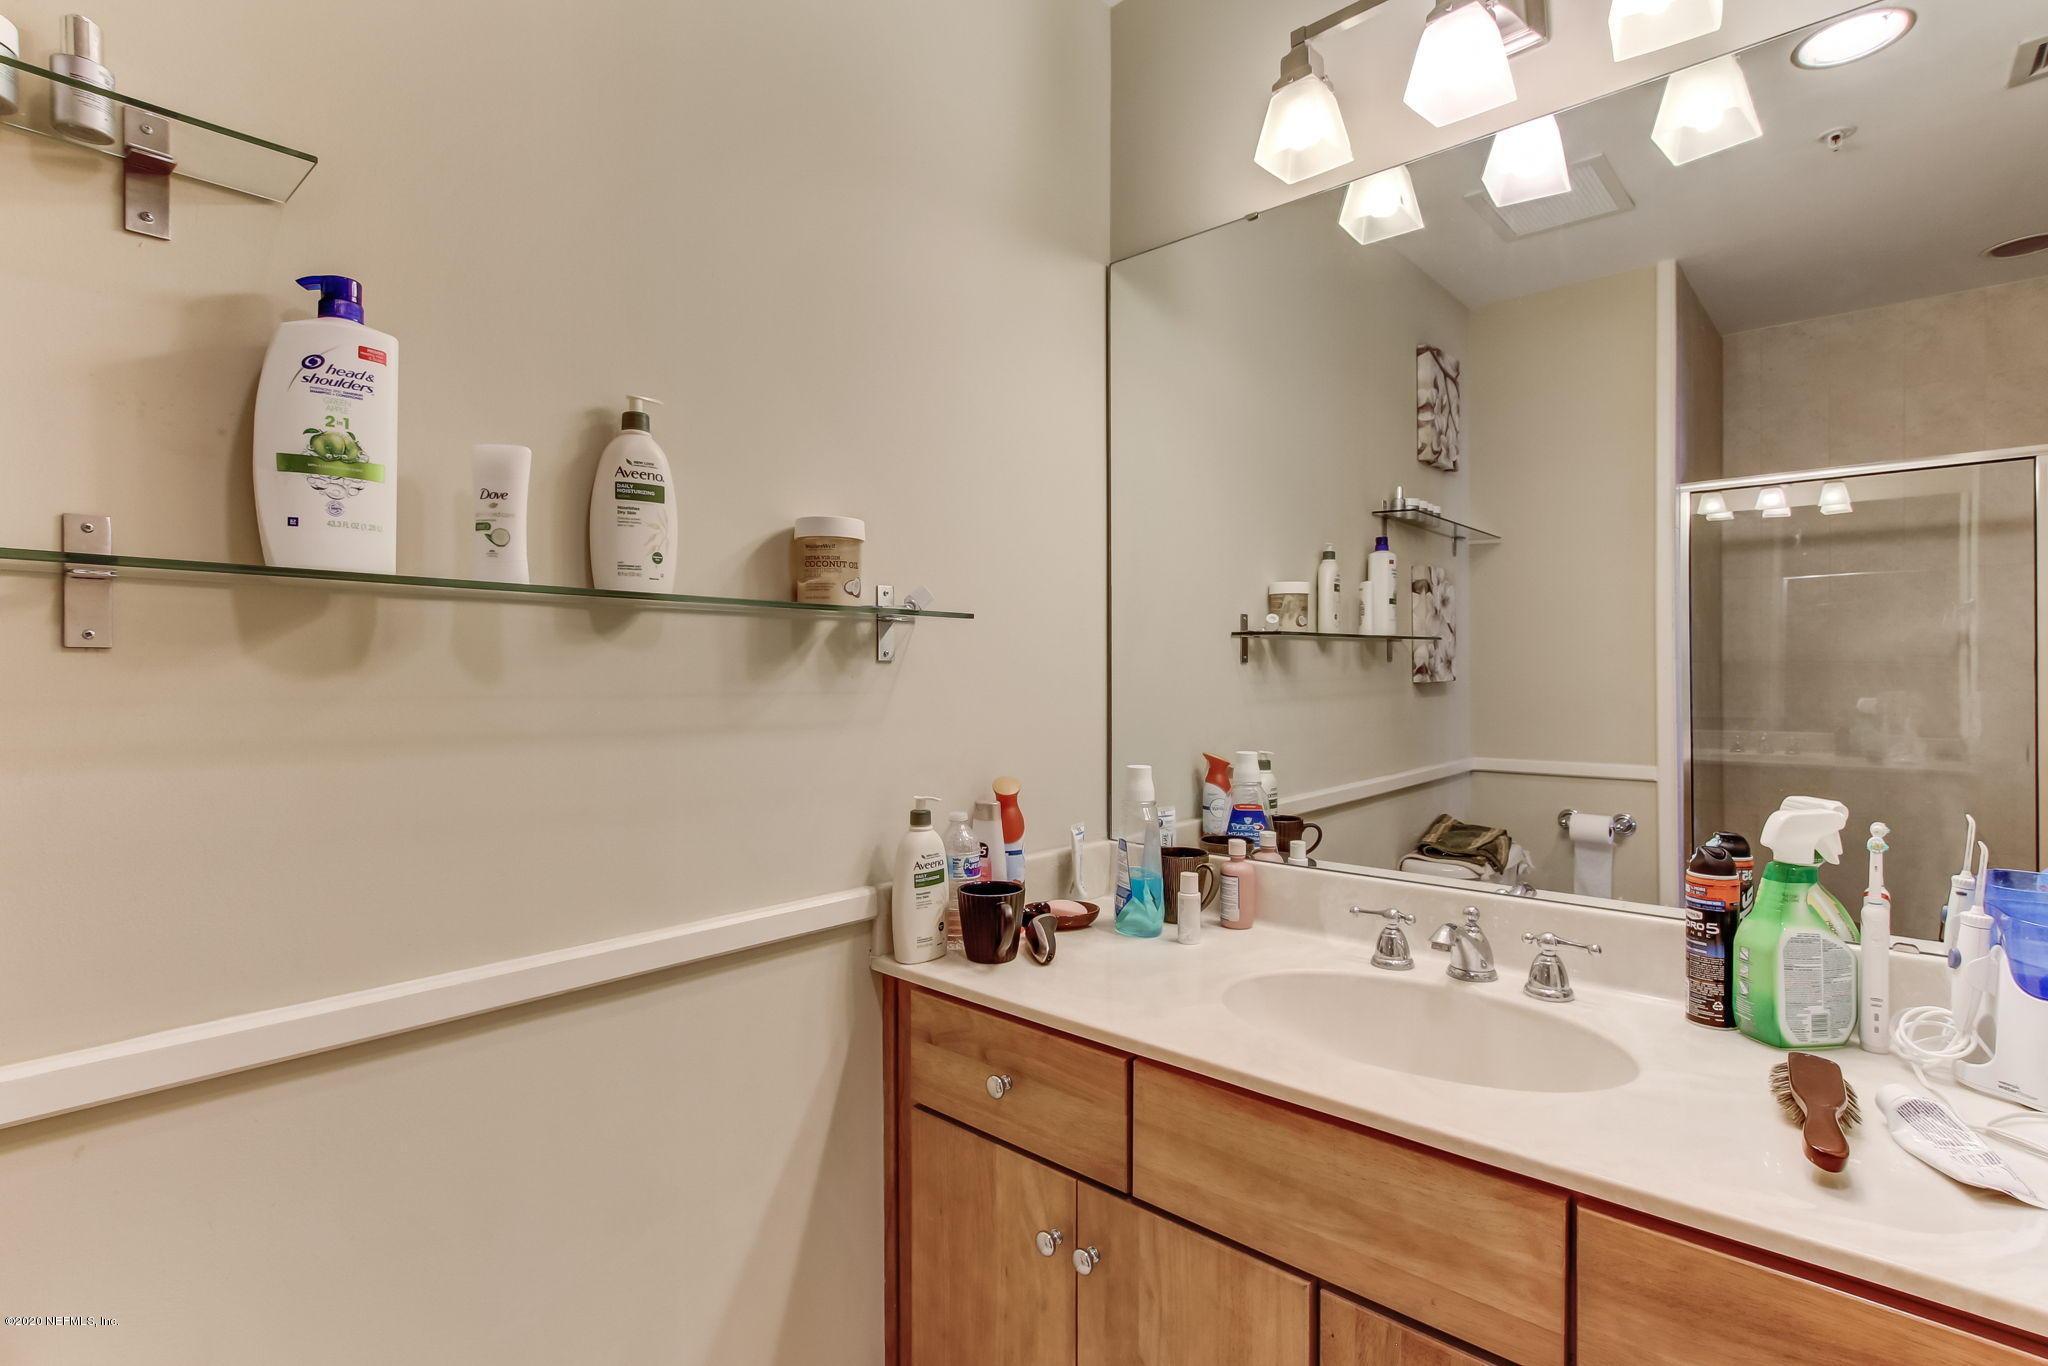 1661 RIVERSIDE, JACKSONVILLE, FLORIDA 32204, 2 Bedrooms Bedrooms, ,2 BathroomsBathrooms,Residential,For sale,RIVERSIDE,1048413